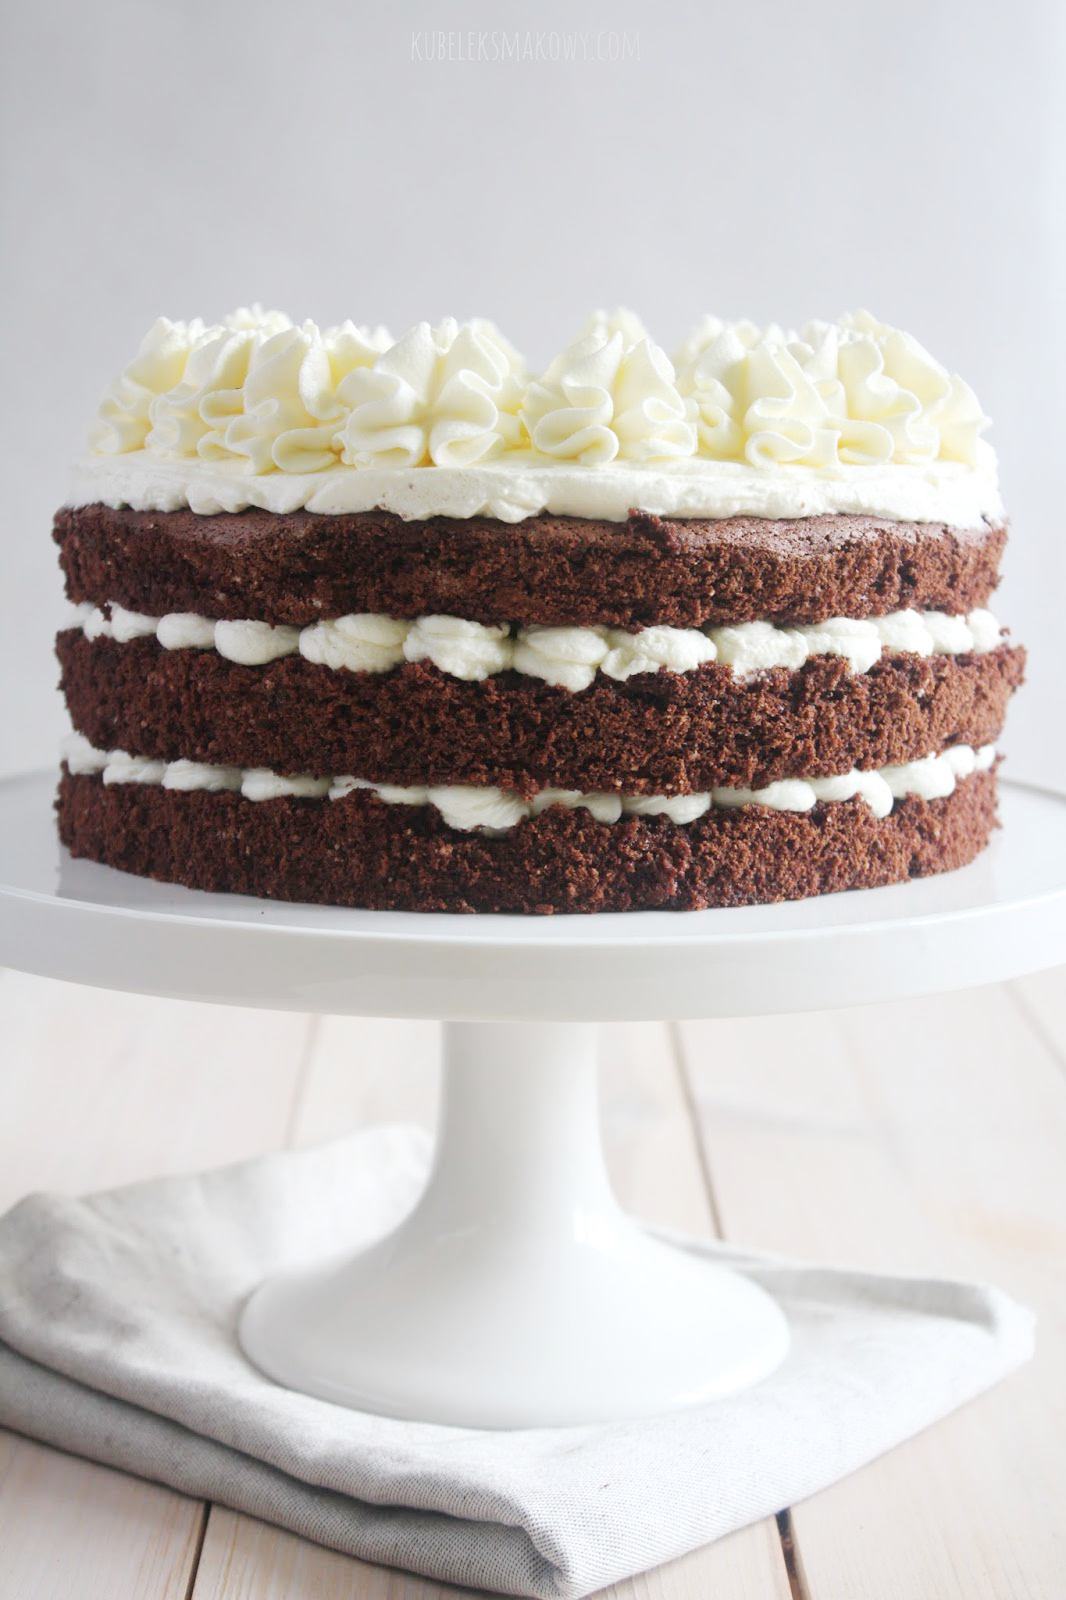 ciasto wuzetka - przepis